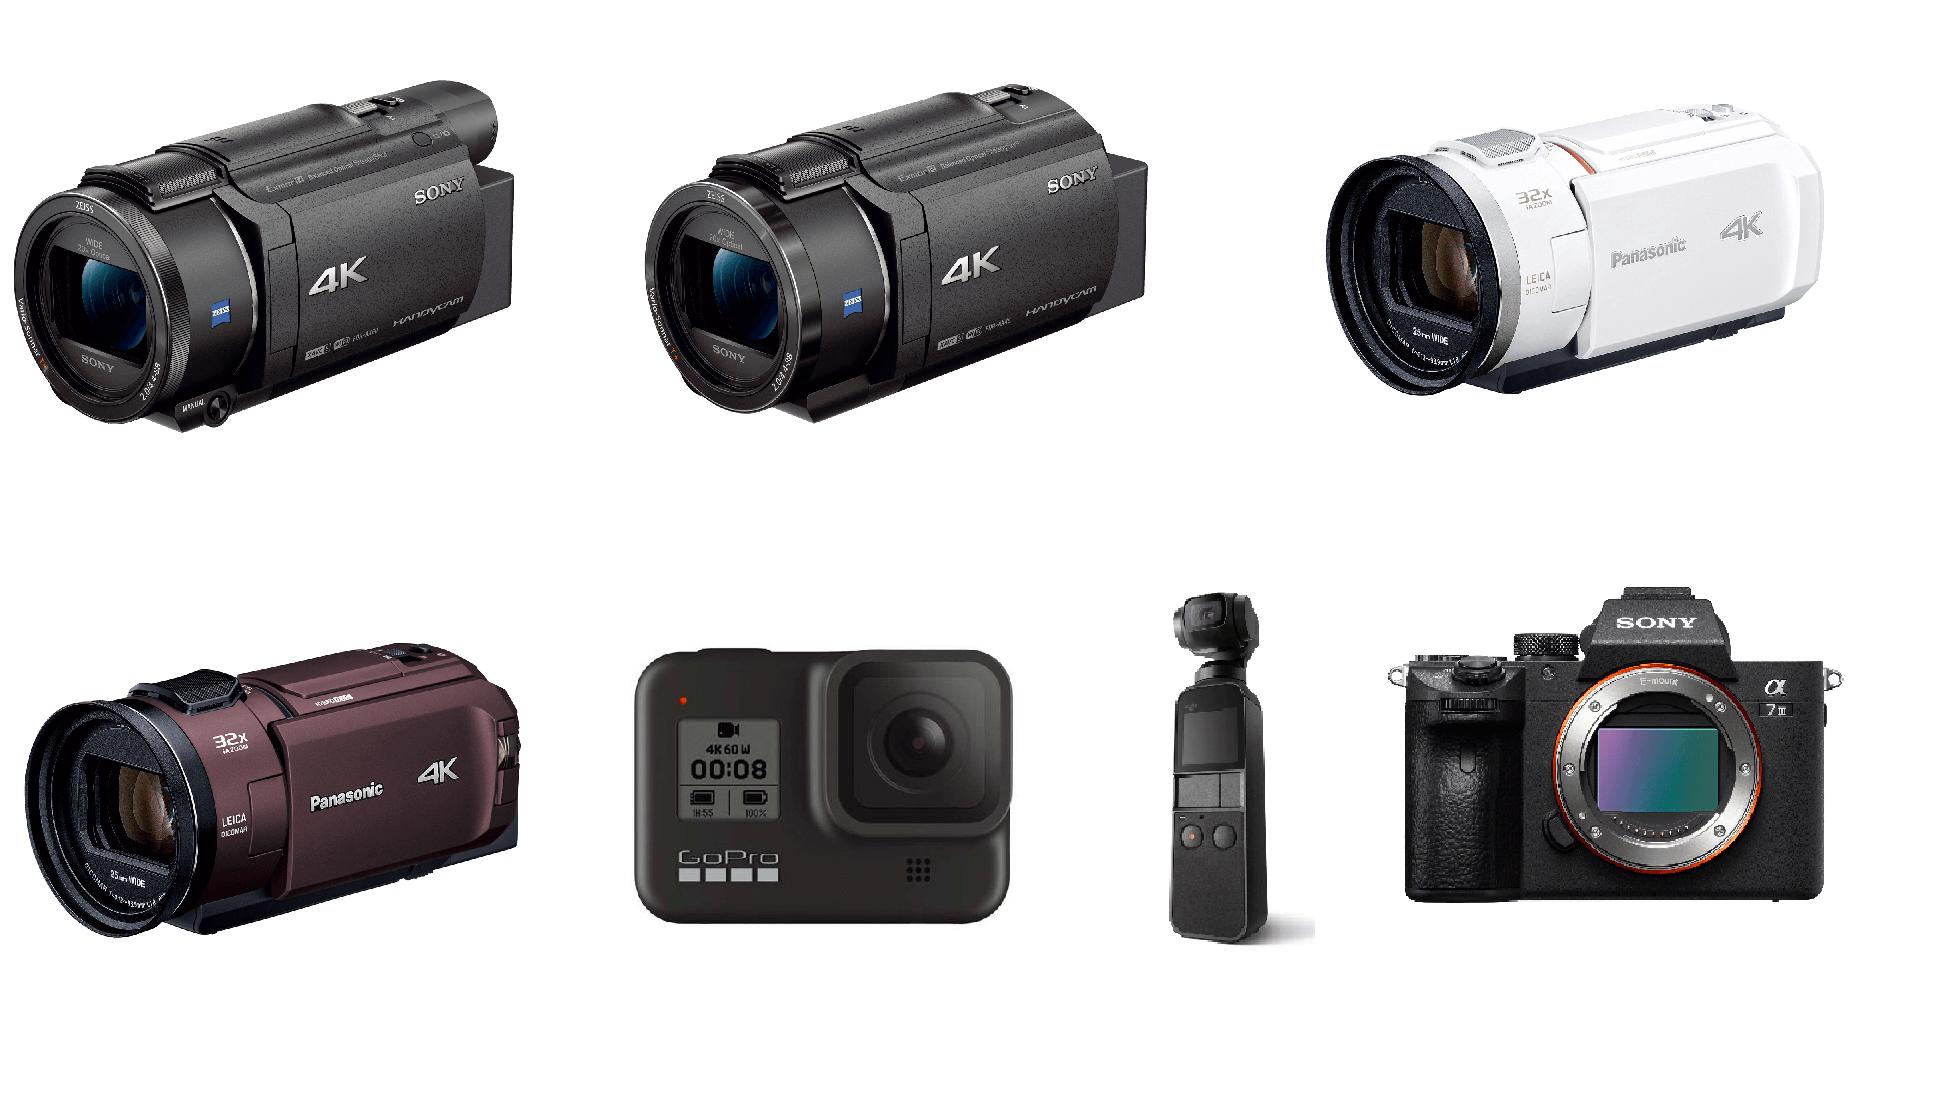 4Kビデオカメラ アイキャッチ